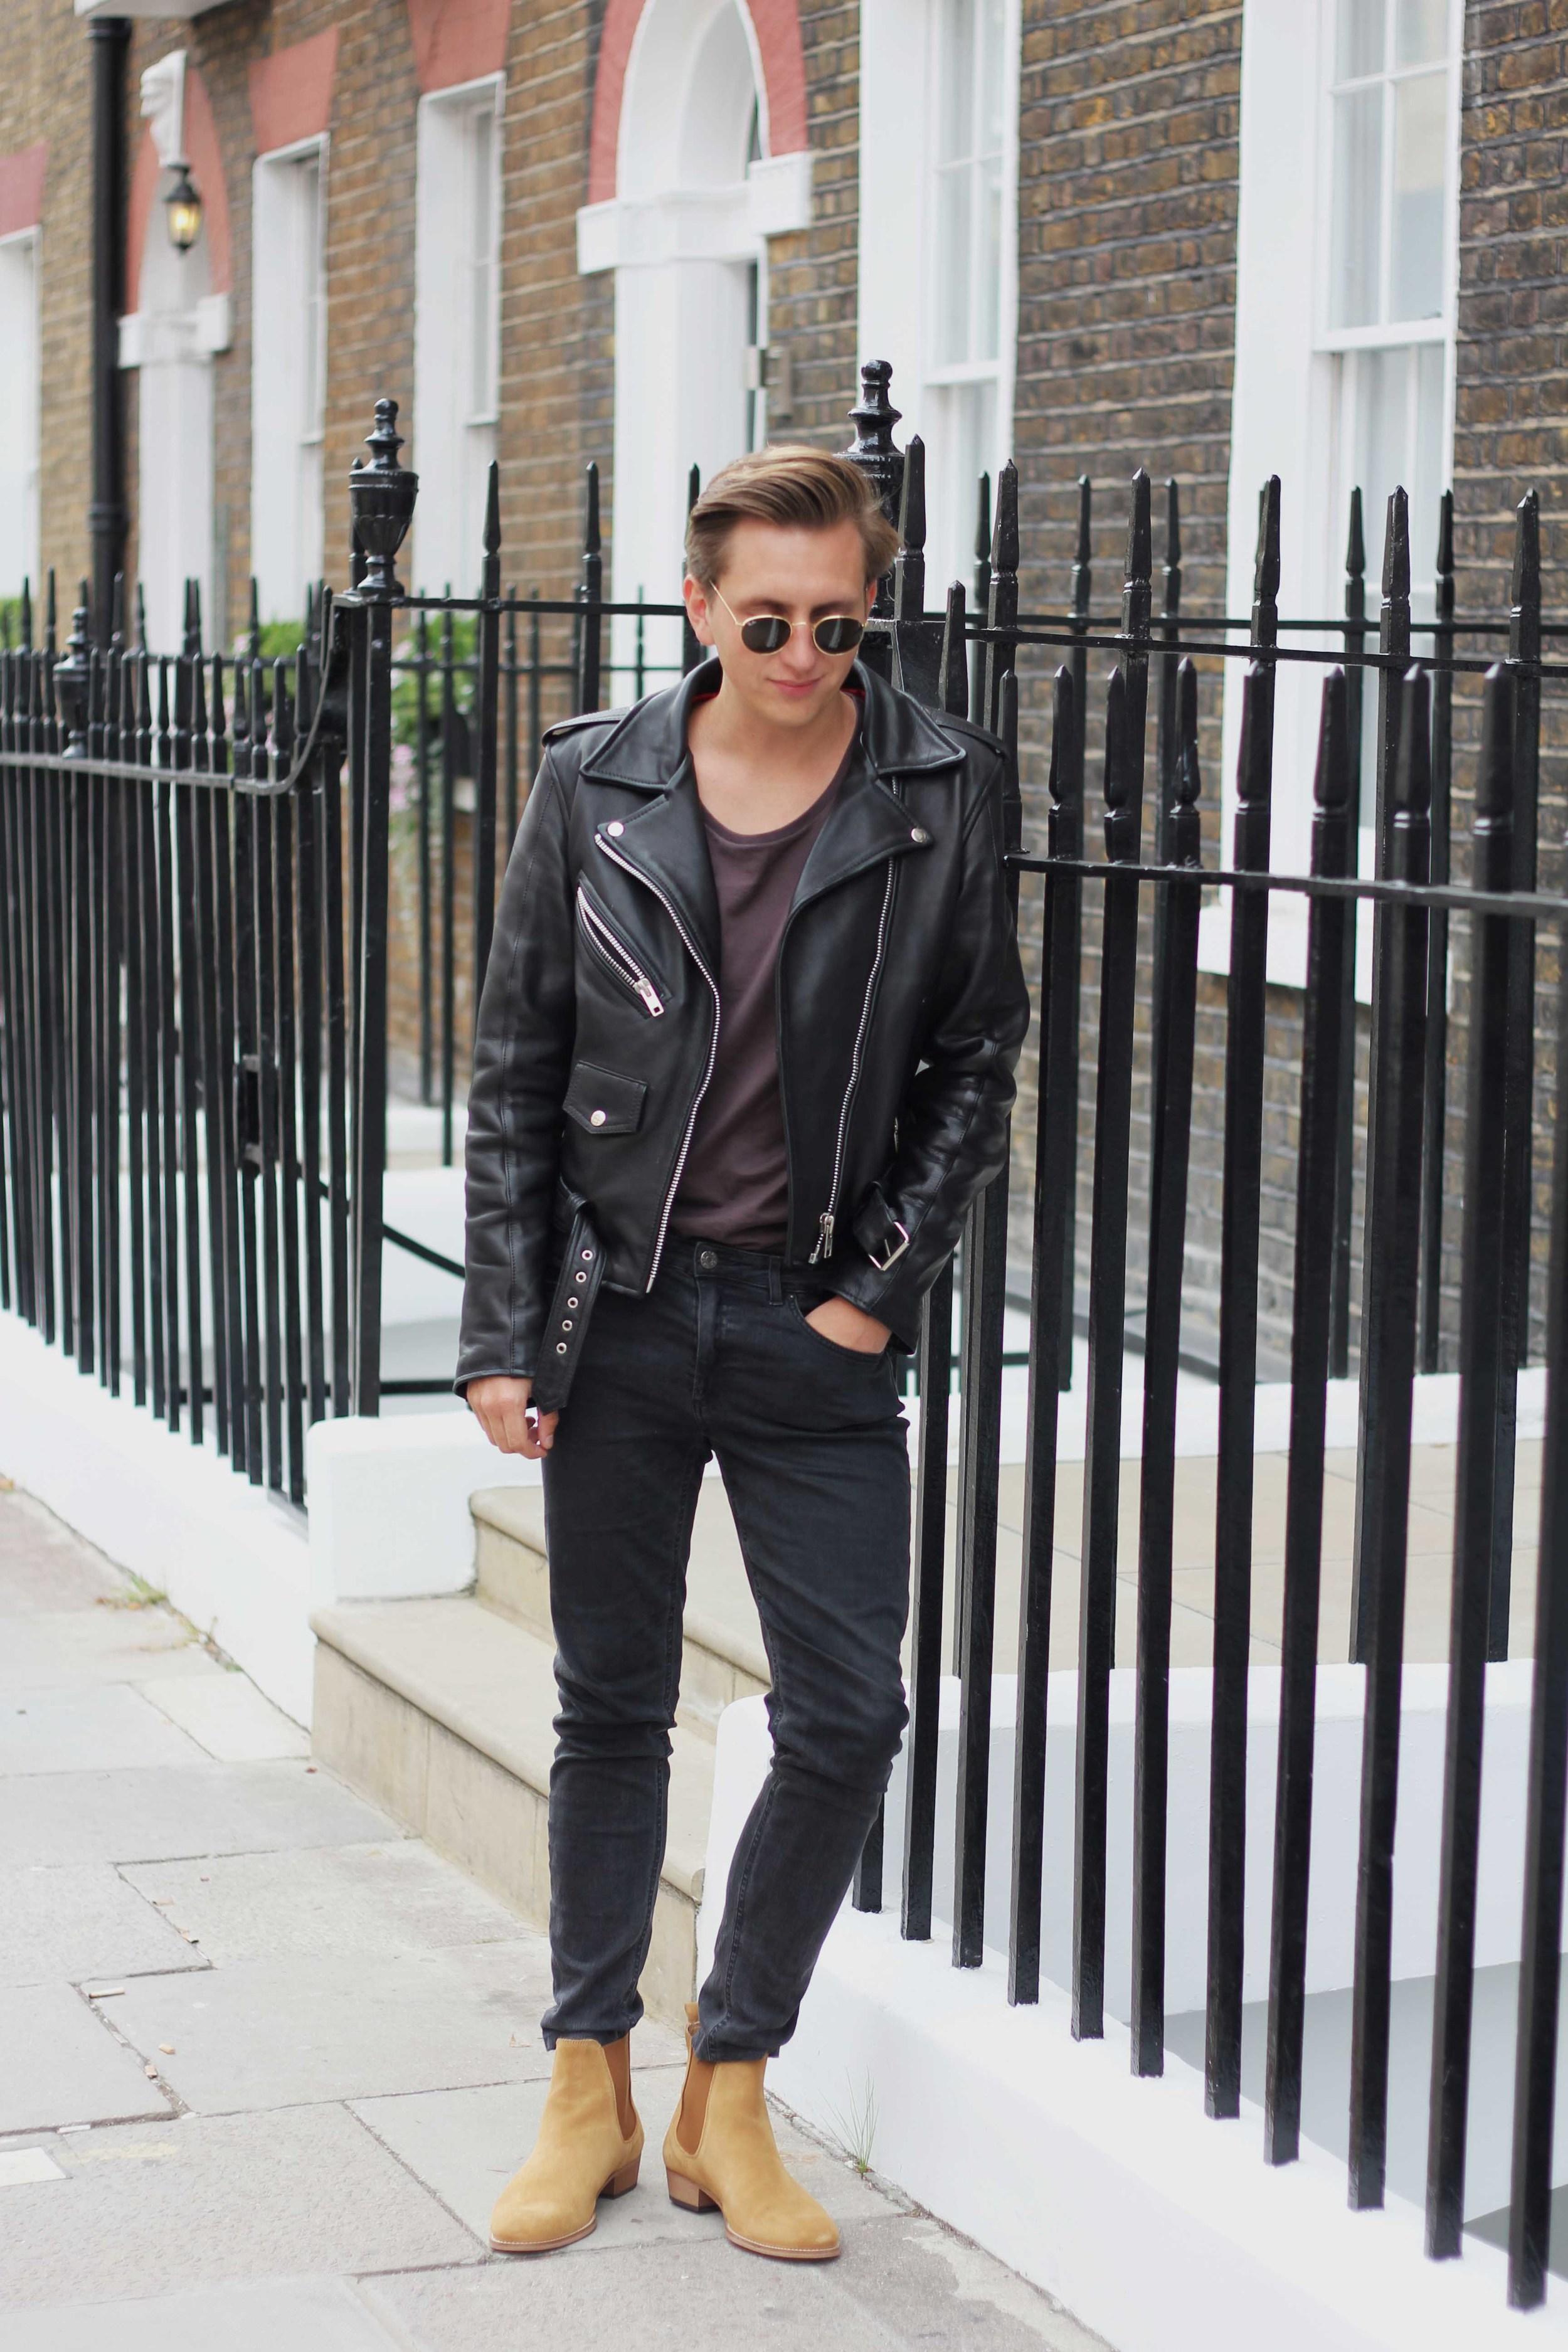 rockandroll_acnestudios_rayban_ootd_menswear_mensfashion_london_marylebone_leatherjacket_biker